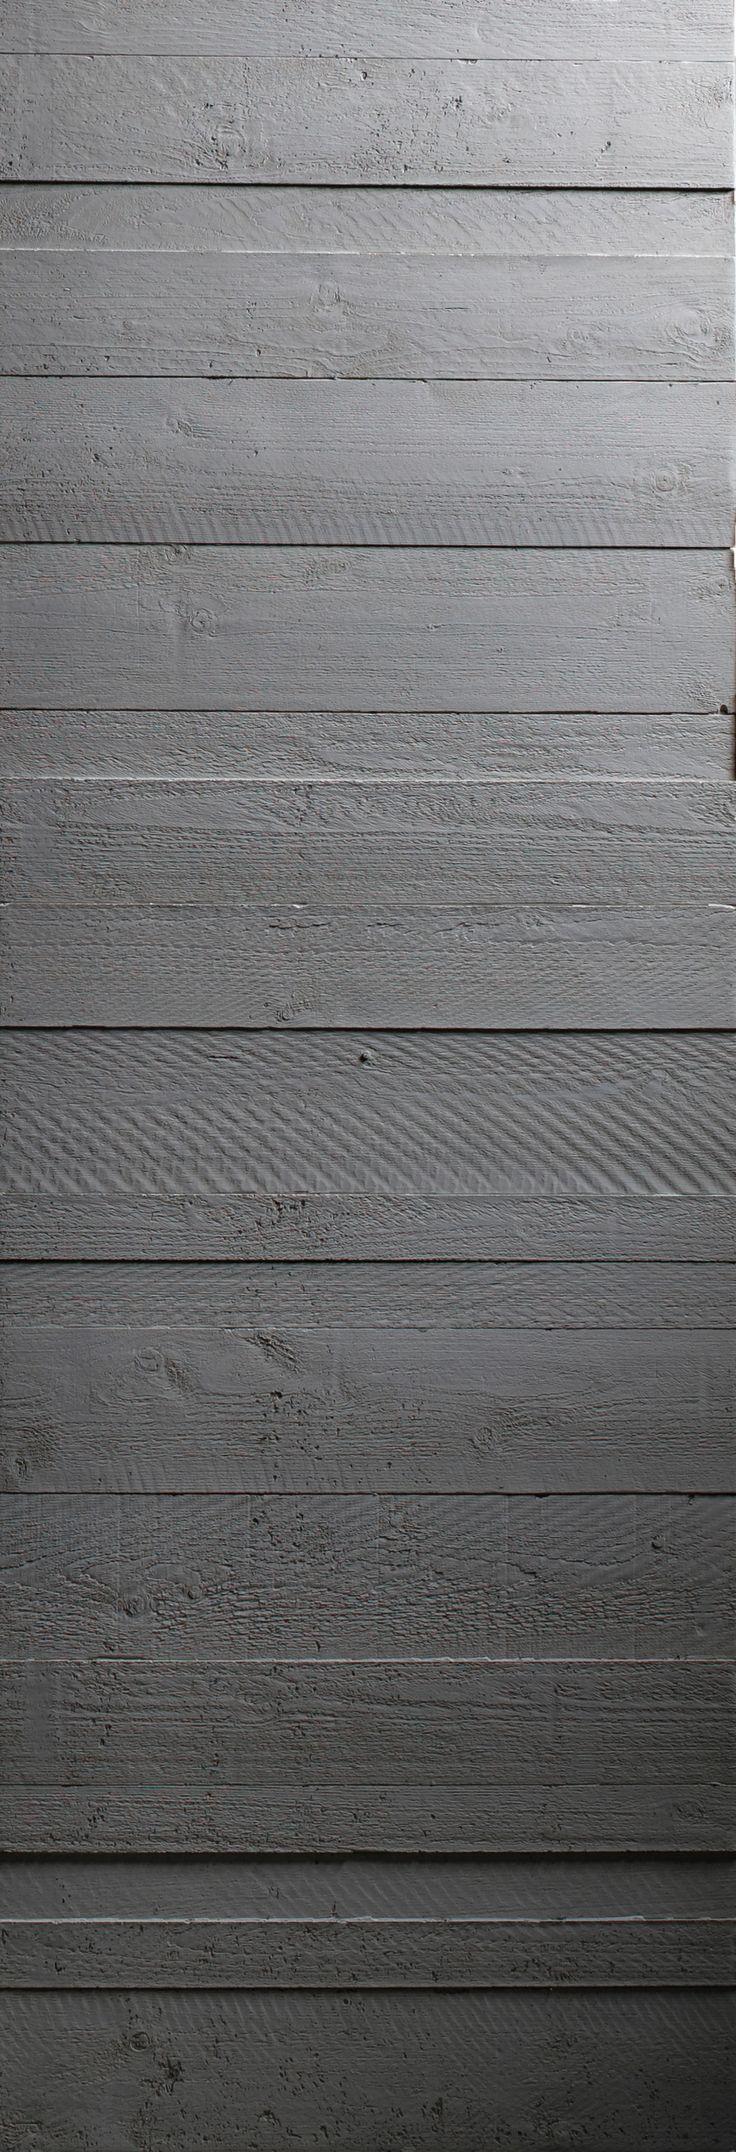 17 best images about material on pinterest bespoke tile and porcelain tiles - Beton door lcda ...